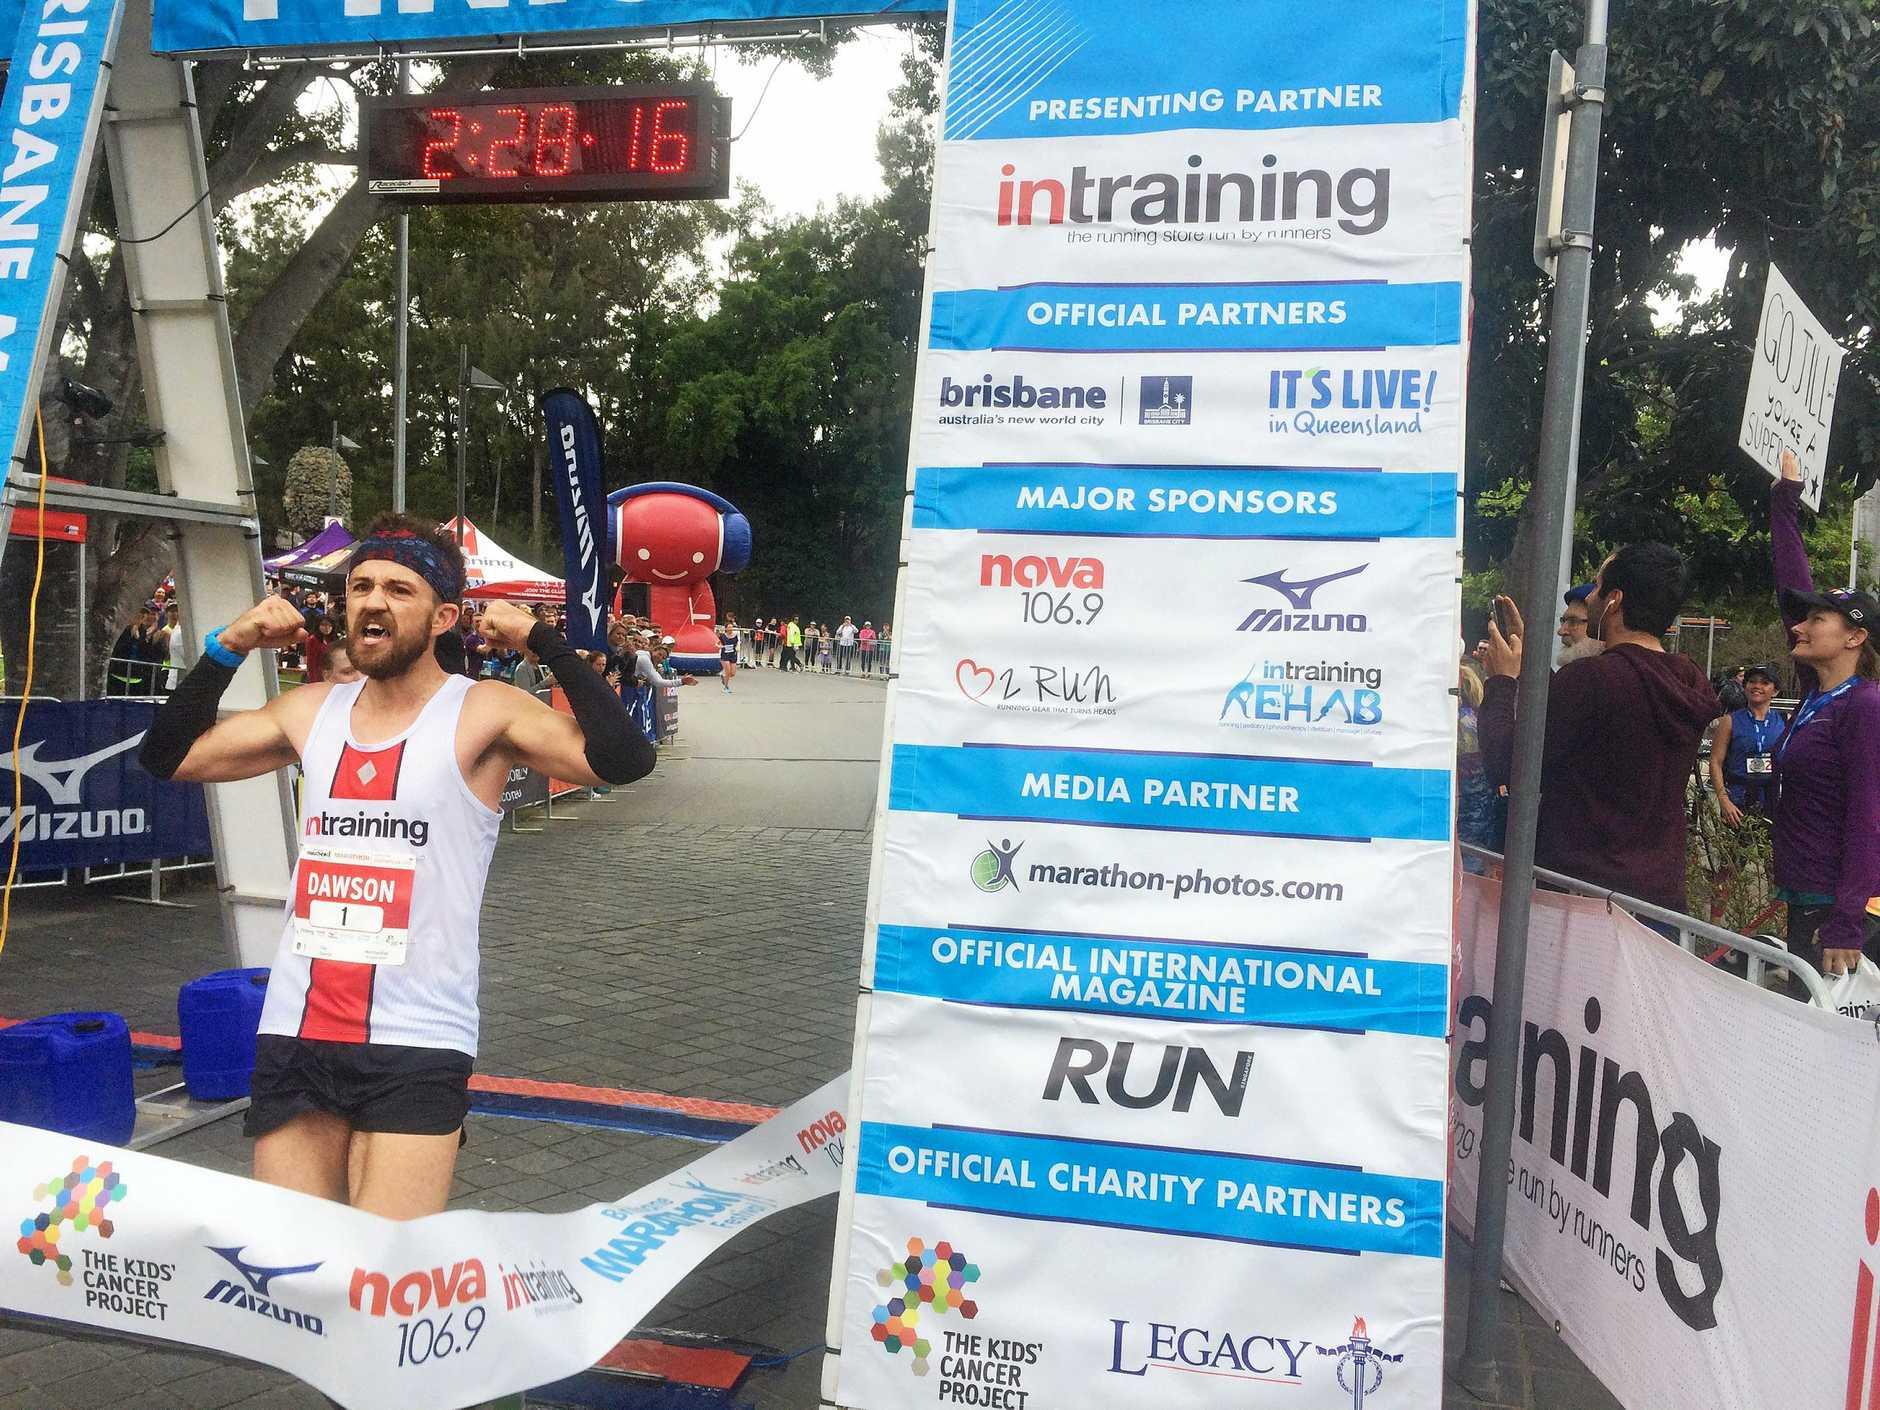 Ipswich runner Clay Dawson shows his delight at winning the Brisbane Marathon.Photo: Contributed